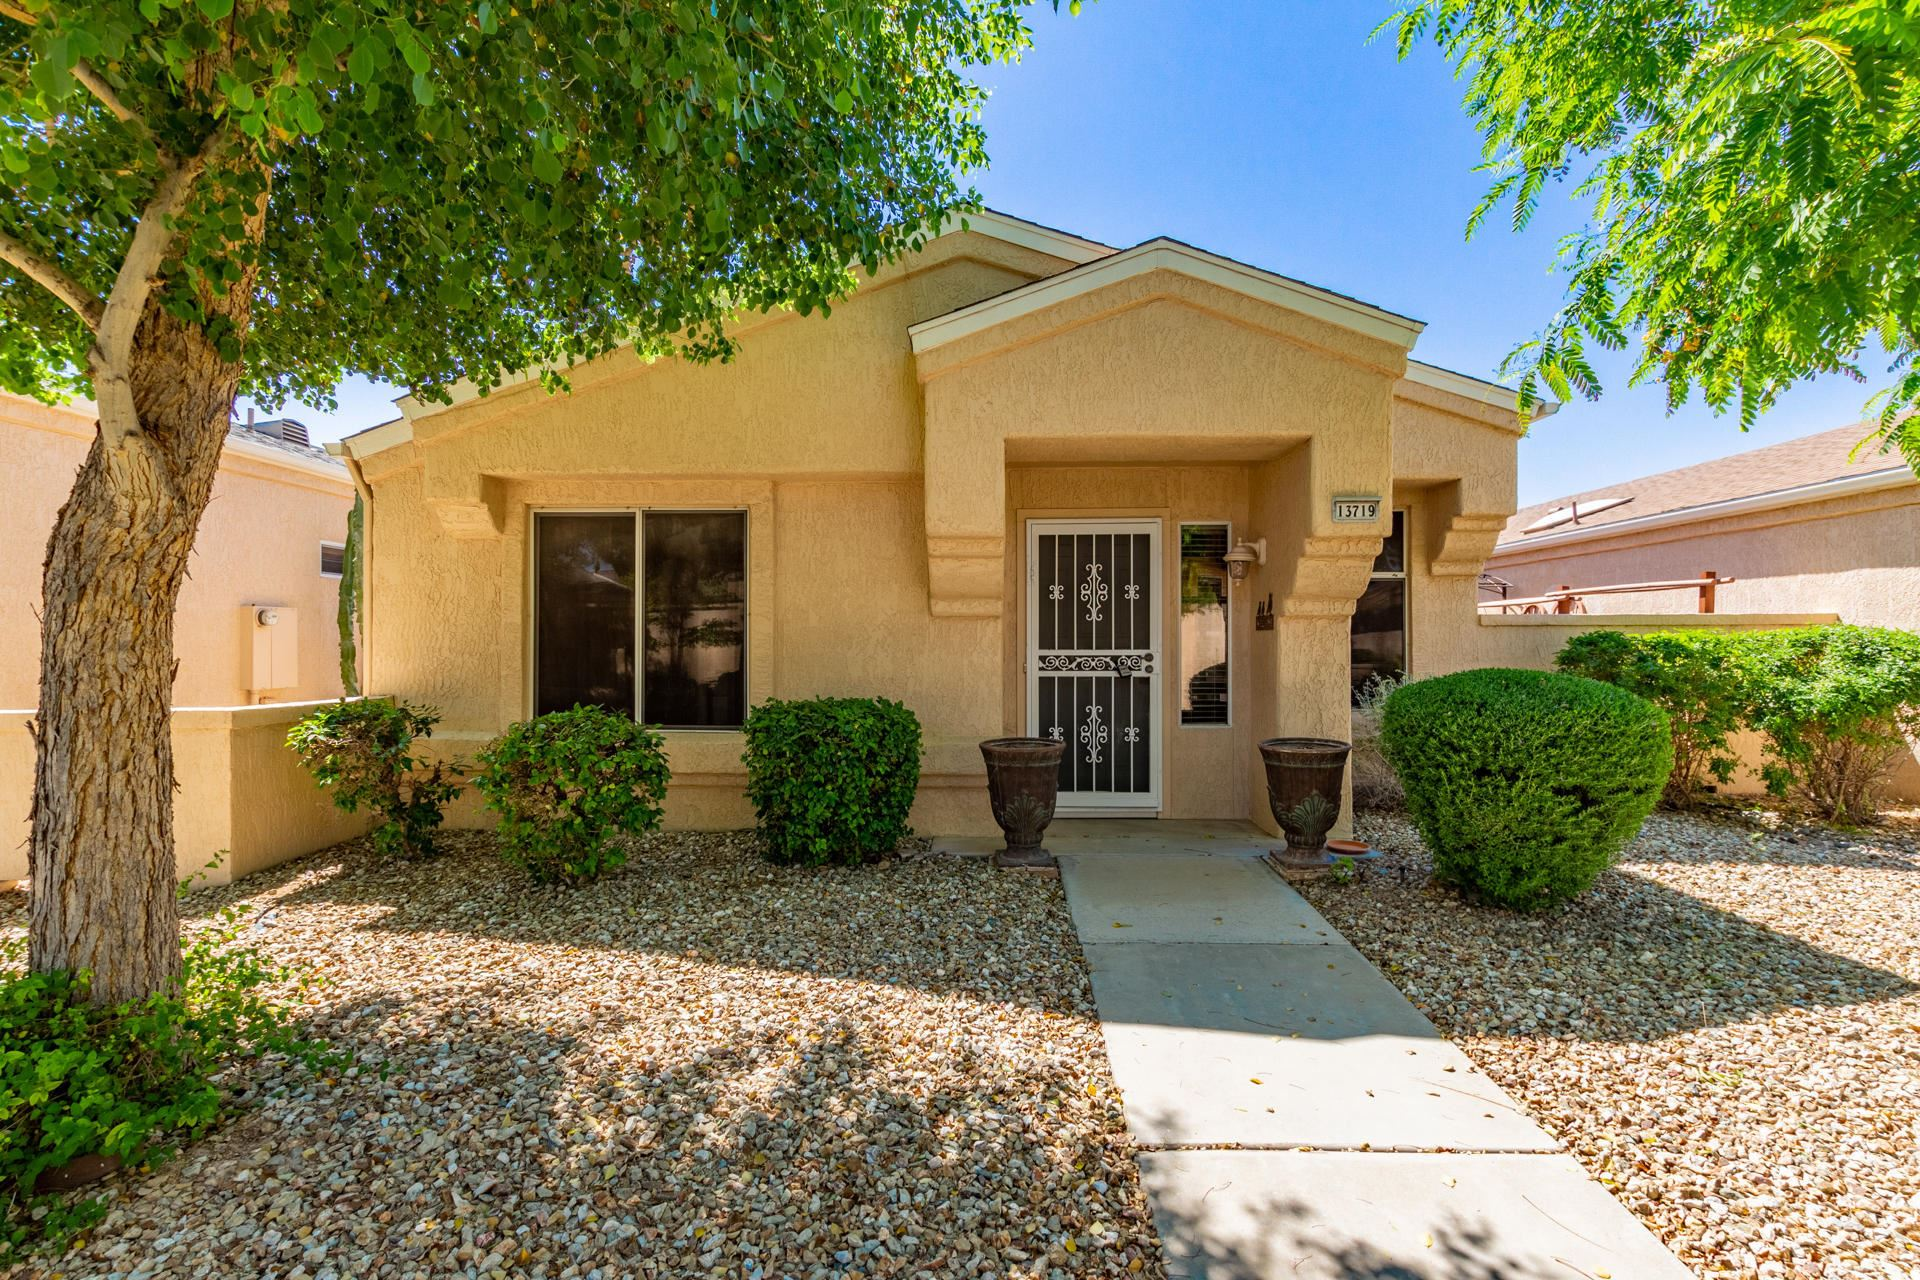 Photo of 13719 W COUNTRYSIDE Drive, Sun City West, AZ 85375 (MLS # 6232216)